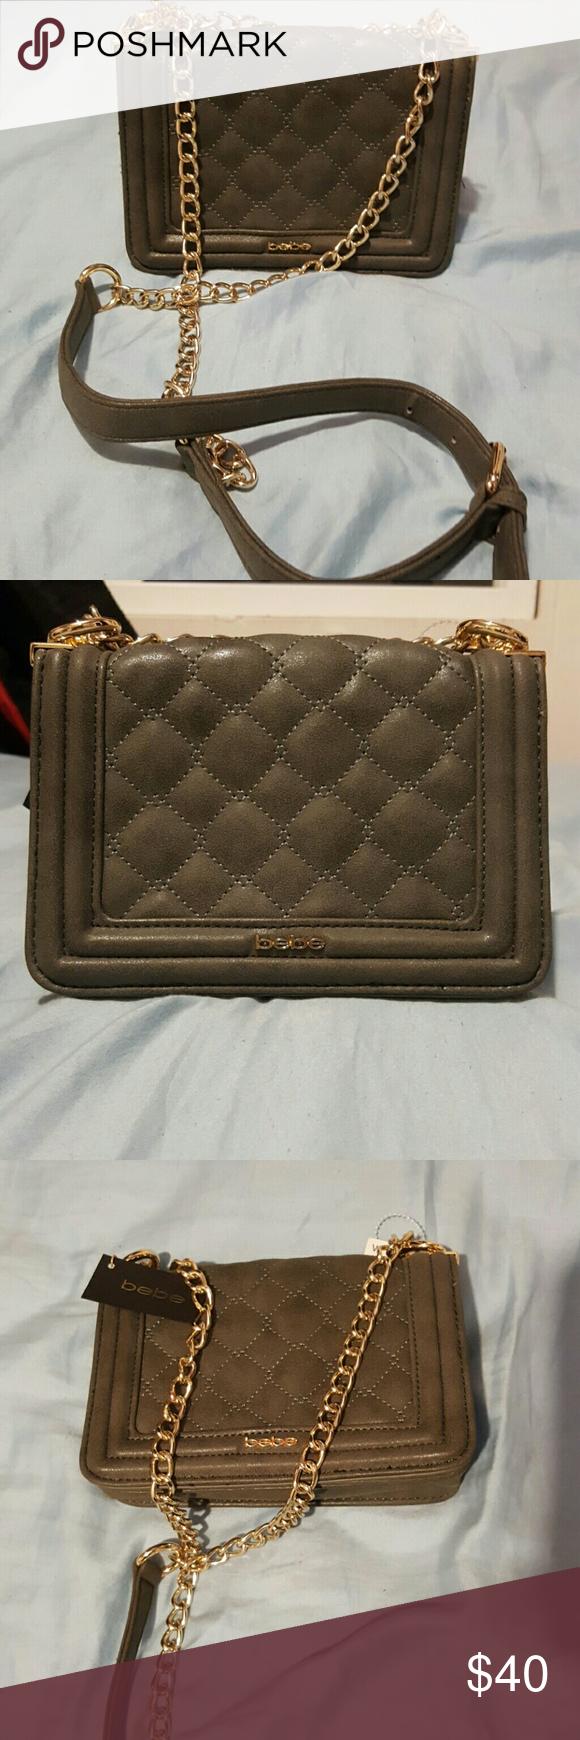 60a567c8a2 Bebe crossbody purse Bebe gray crossbody purse. Gold adjustable chain  strap. Super cute little bag. bebe Bags Crossbody Bags